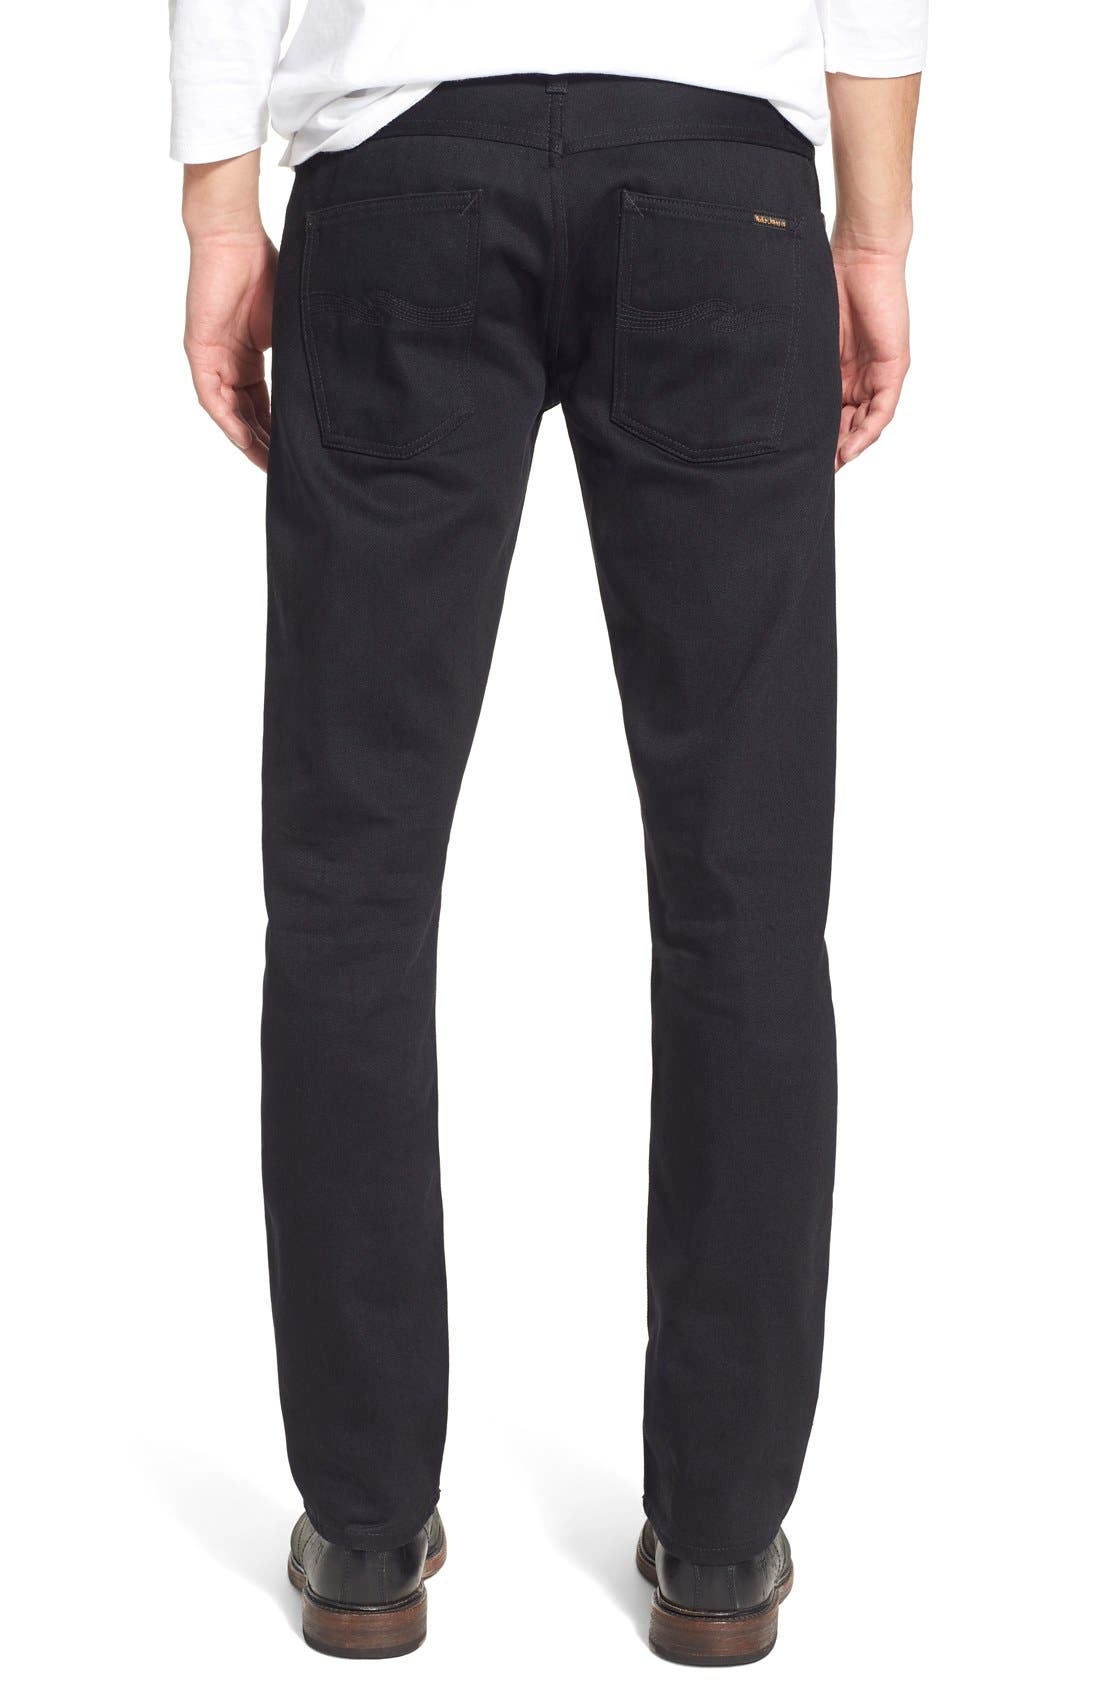 NUDIE JEANS,                             'Grim Tim' Slim Fit Raw Selvedge Jeans,                             Alternate thumbnail 5, color,                             001